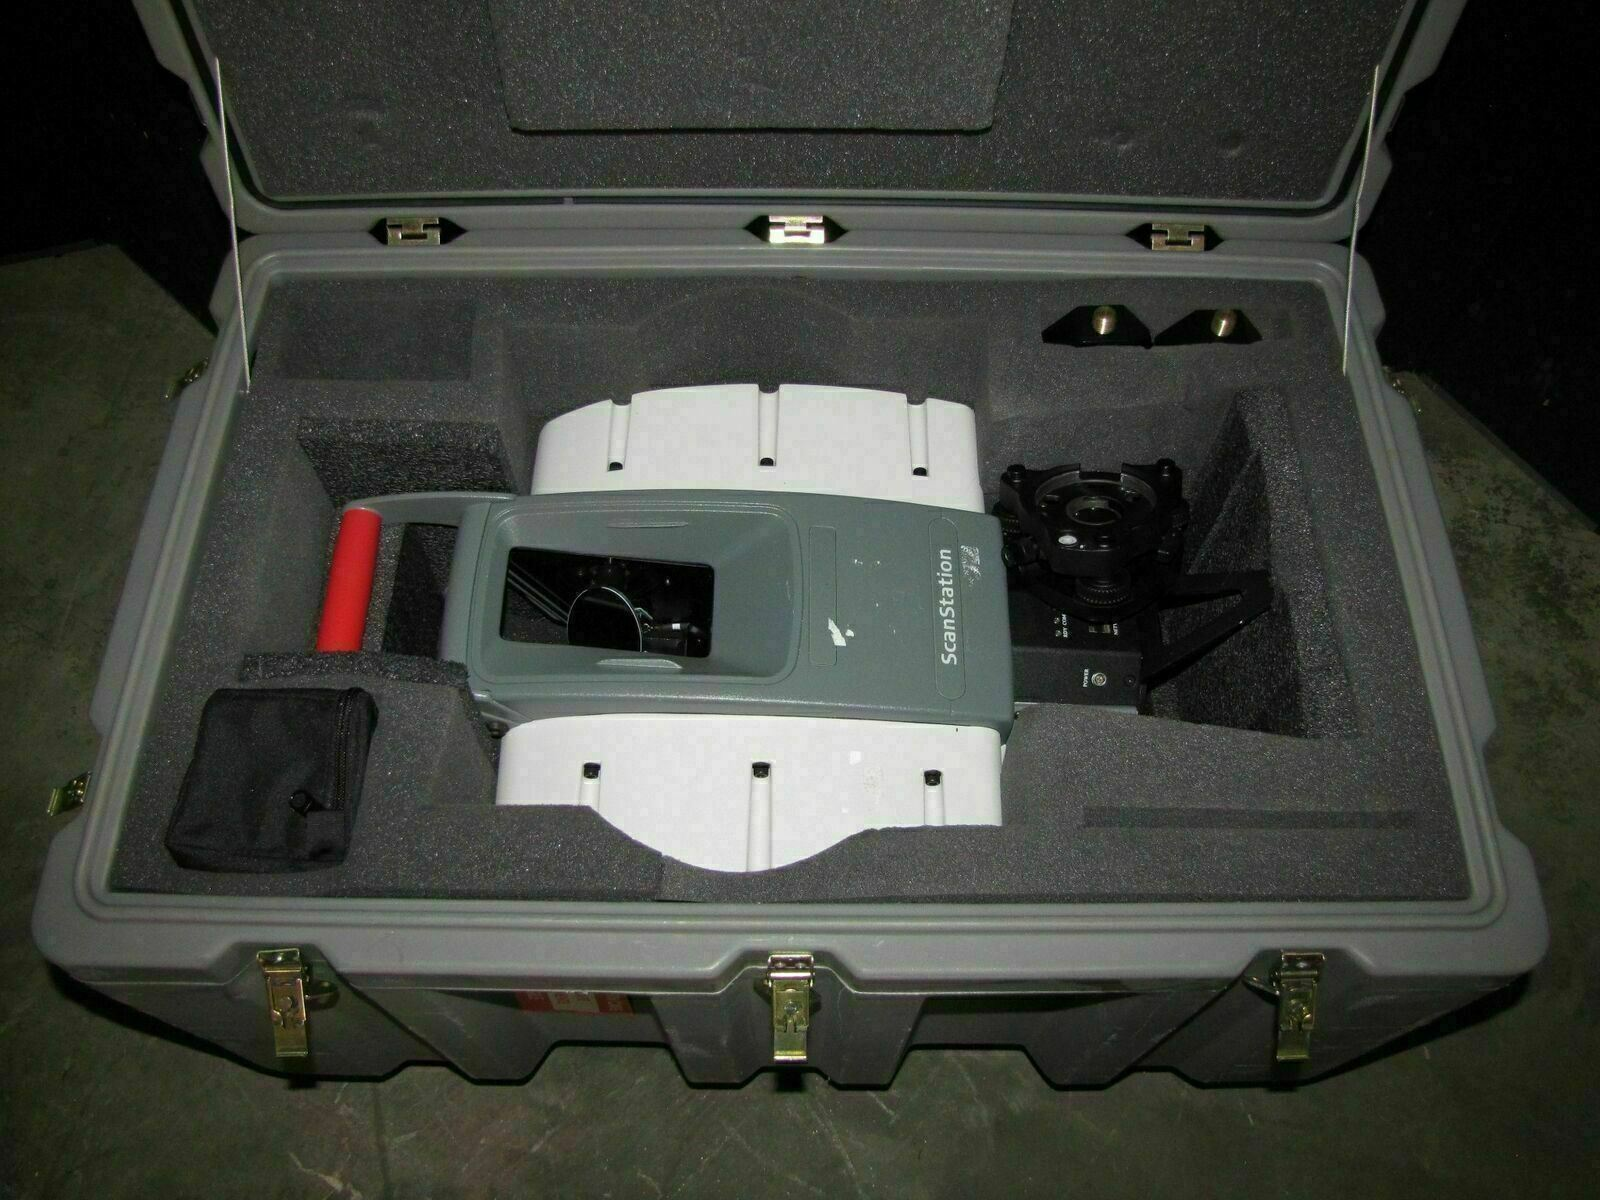 Leica Geosystems HDS3000 3D Laser Scanner HDS 3600 ScanStation  (#2645) /(#3082)